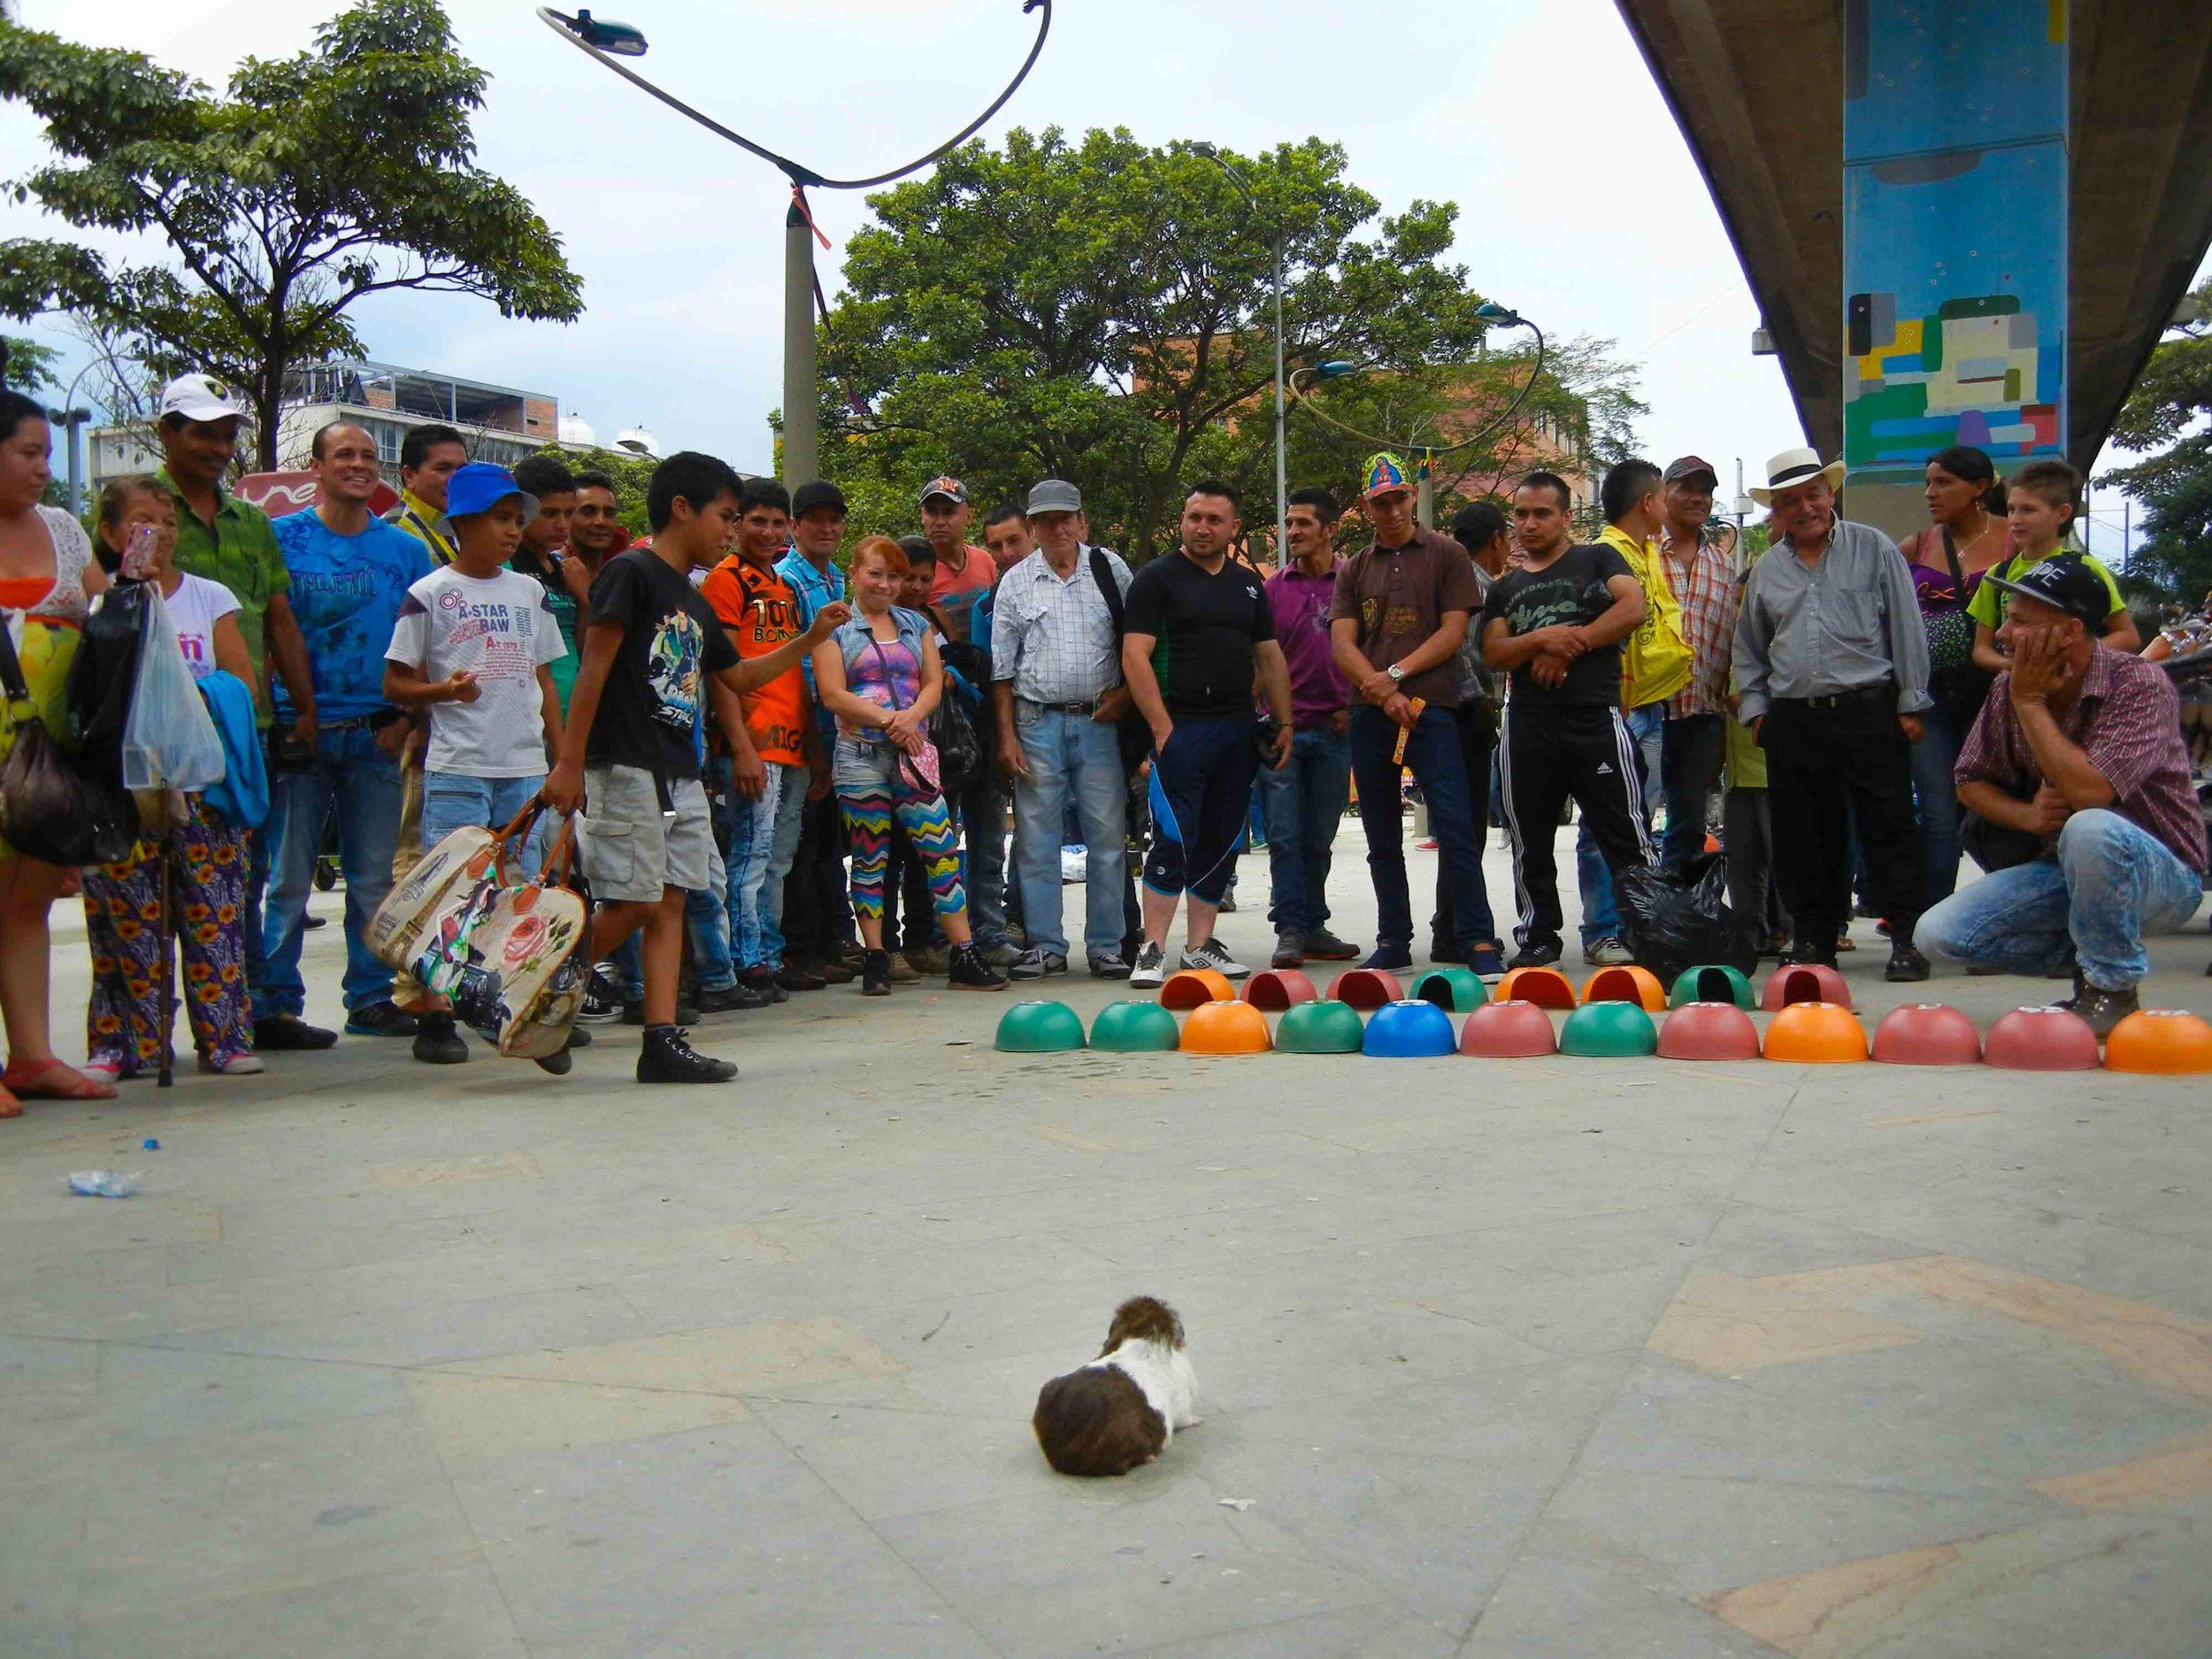 2015_10_Medellin-38.jpg